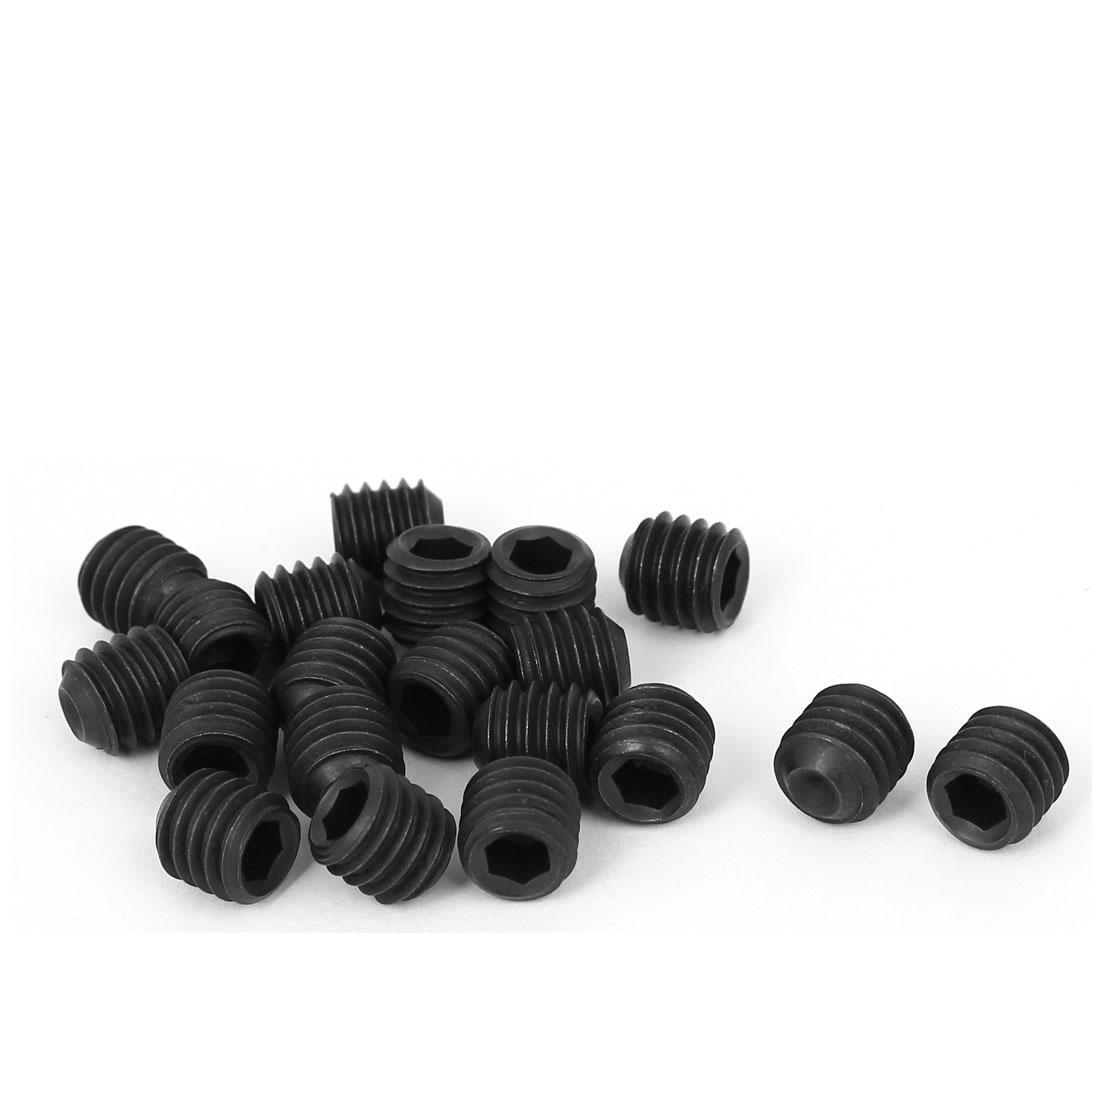 "12.9 Grade 3/8""-16 x 3/8"" Thread Cup Point Hexagon Socket Set Grub Screws 20 Pcs"